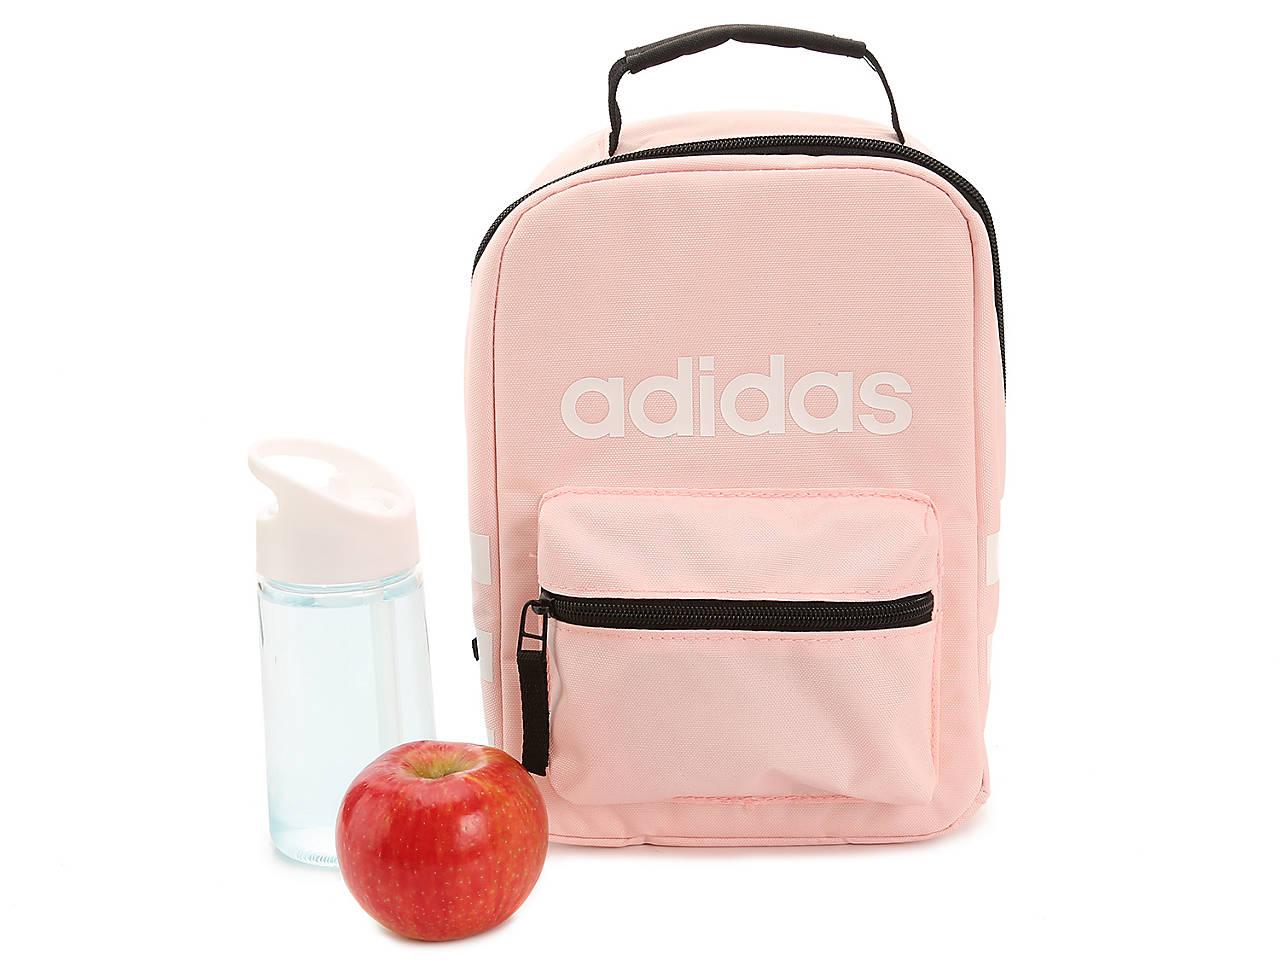 da489656b0 adidas Santiago Lunch Box Women s Handbags   Accessories